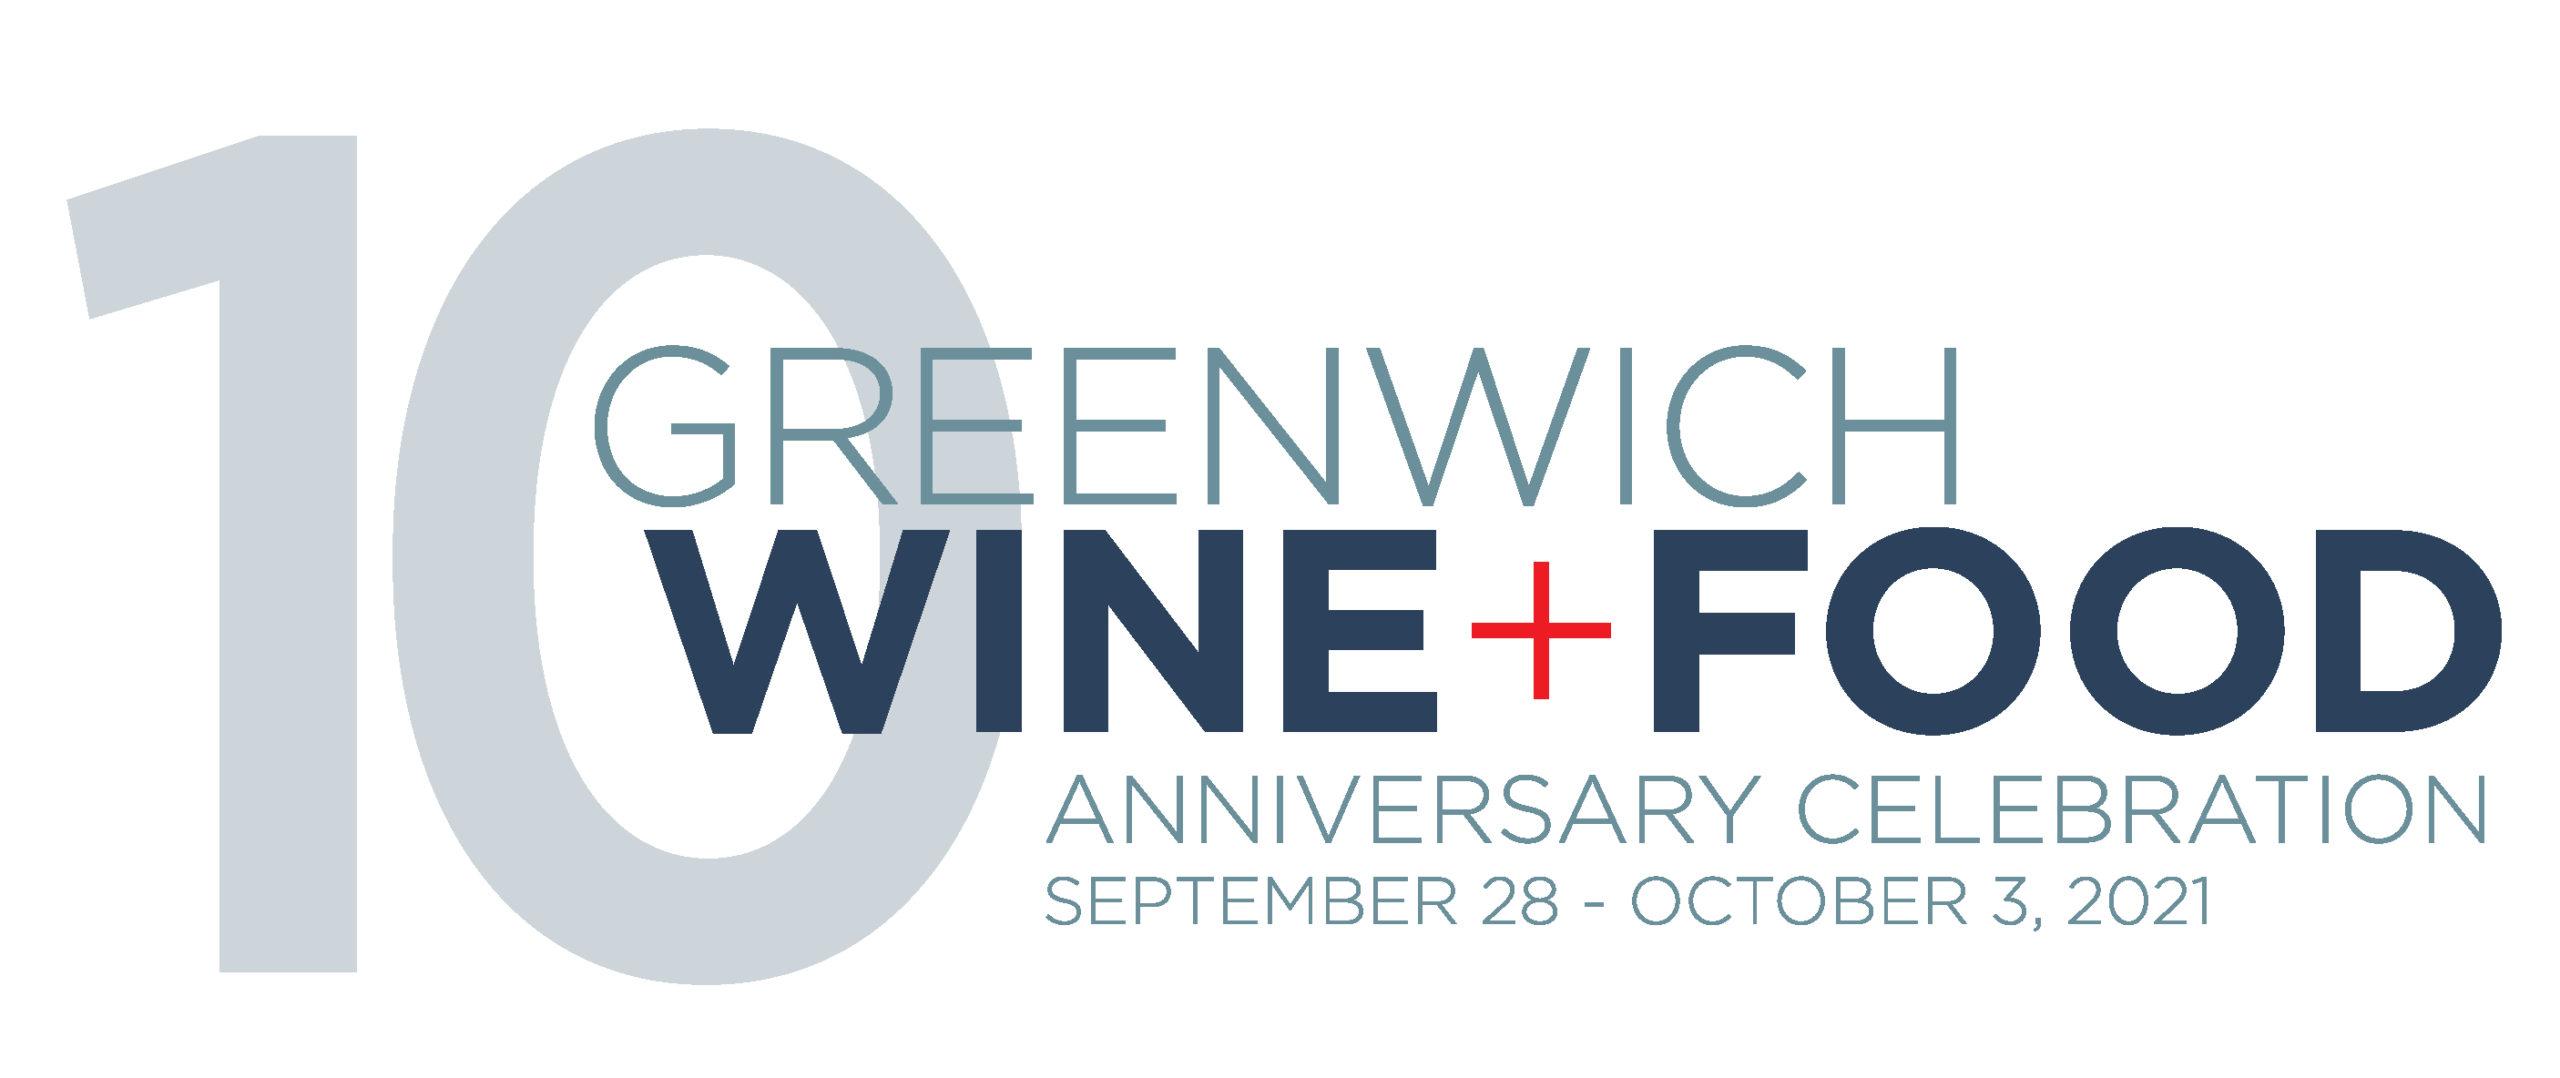 September 28 – October 3, 2021: Greenwich Wine + Food